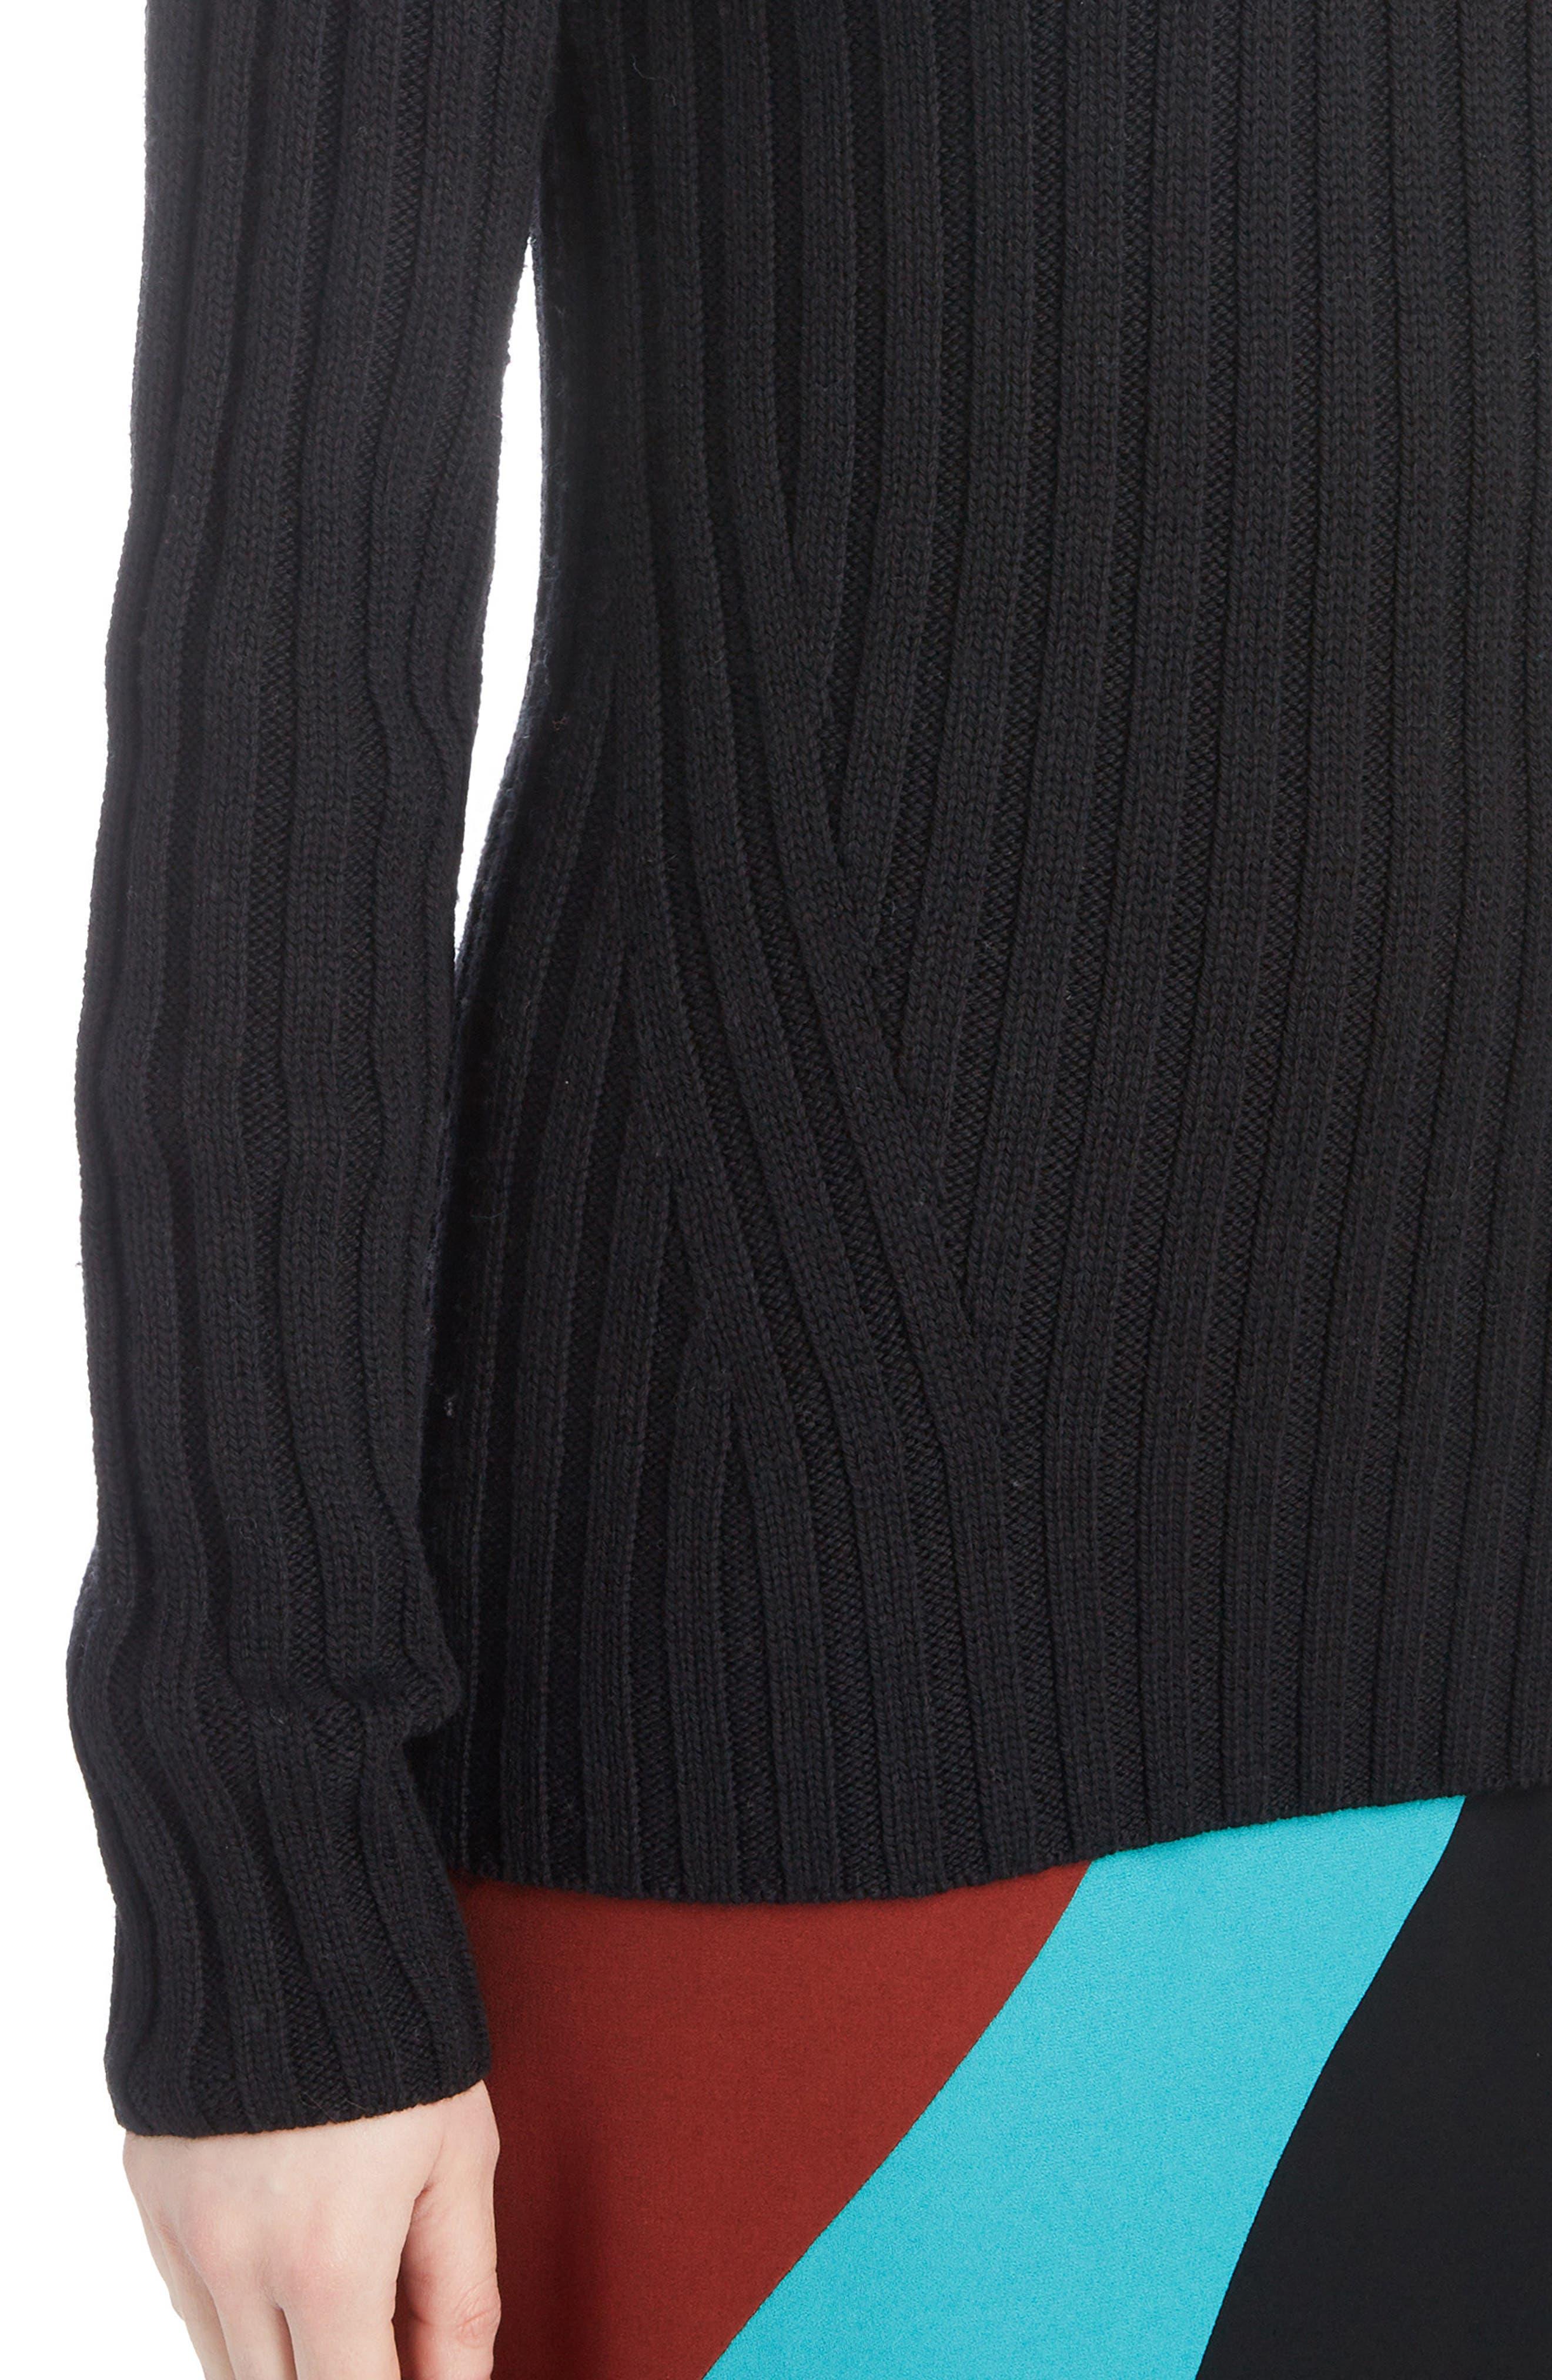 DRIES VAN NOTEN,                             Turtleneck Wool Sweater,                             Alternate thumbnail 4, color,                             BLACK